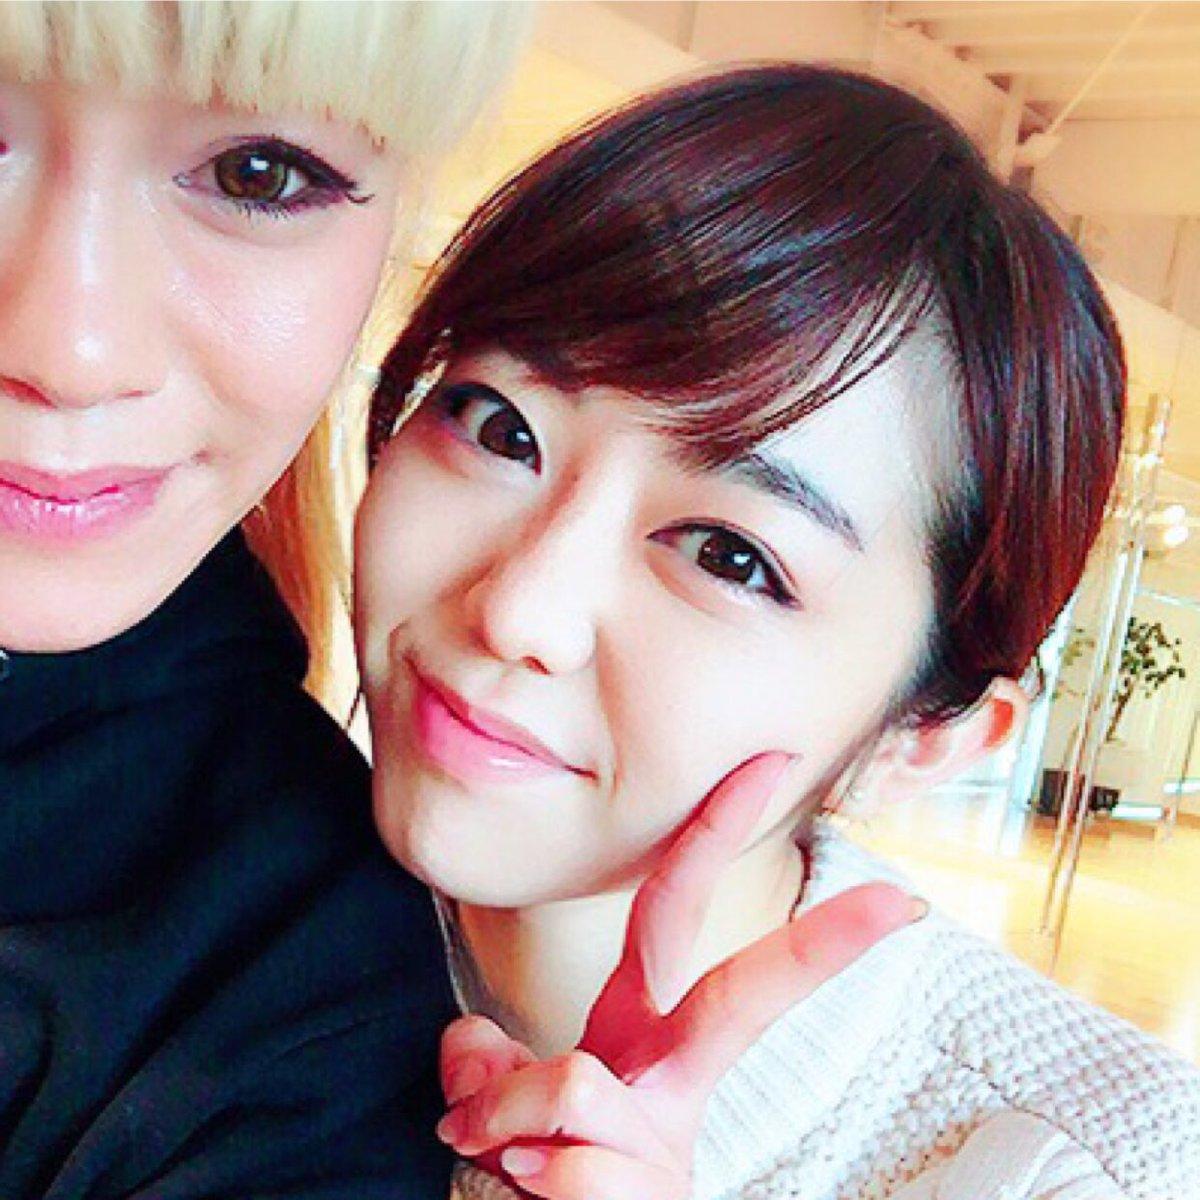 AKB48メンバーの峯岸みなみさんと撮影した内容が2月25日22時から日テレ『ダウタウンDX』にて放送されます〜〜(ू ˃̣̣̣̣̣̣o˂̣̣̣̣̣̣ ू)♡放送をお楽しみに〜#AKB48 #峯岸みなみ#ダウタウンDX https://t.co/vsAZcdEAVW